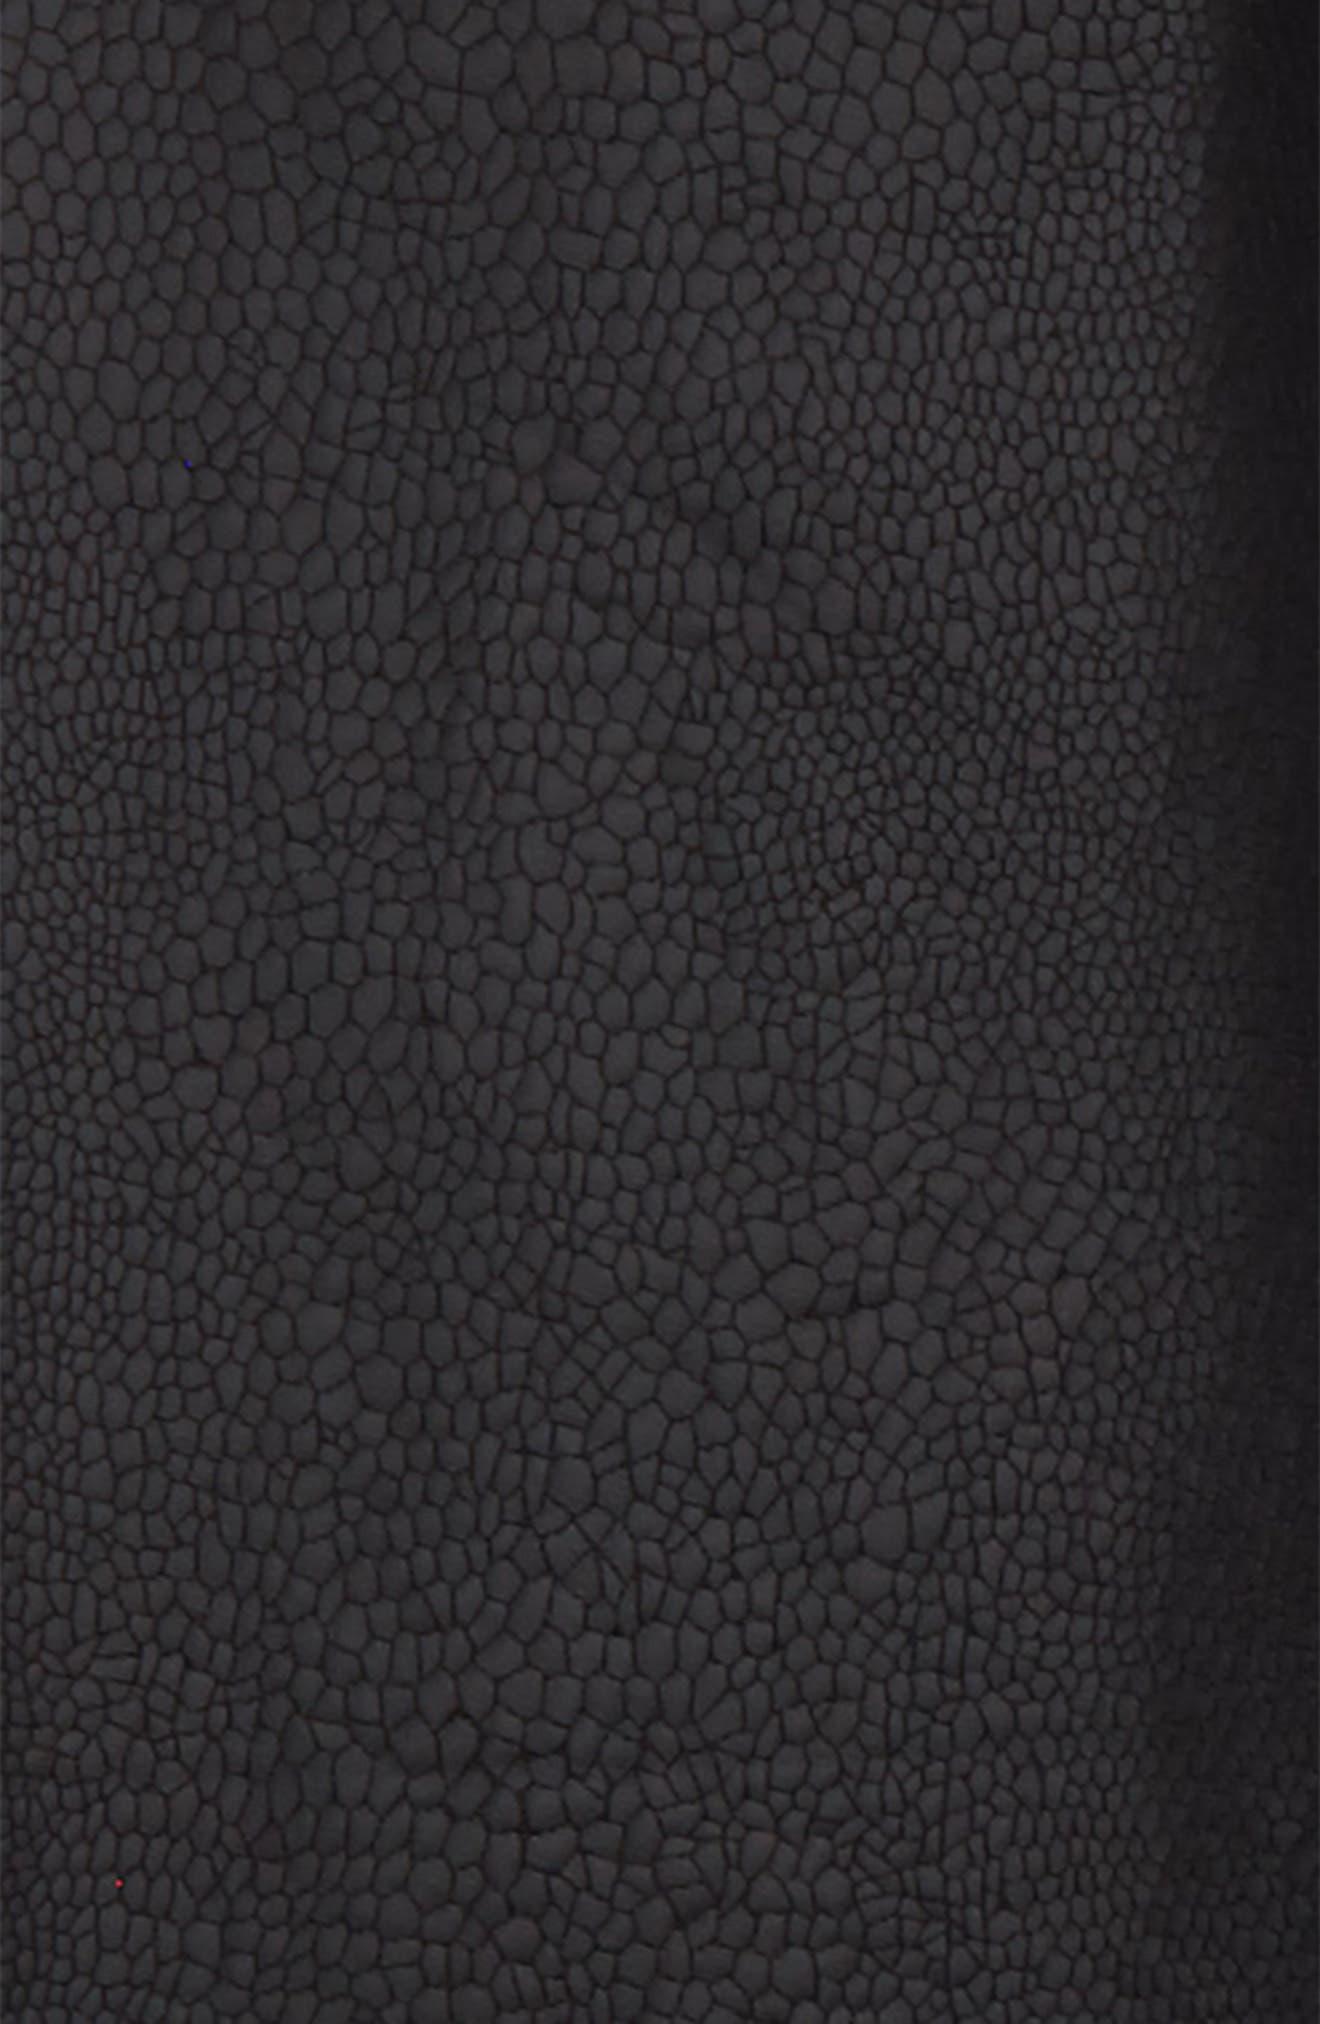 Faux Leather Leggings,                             Alternate thumbnail 2, color,                             006